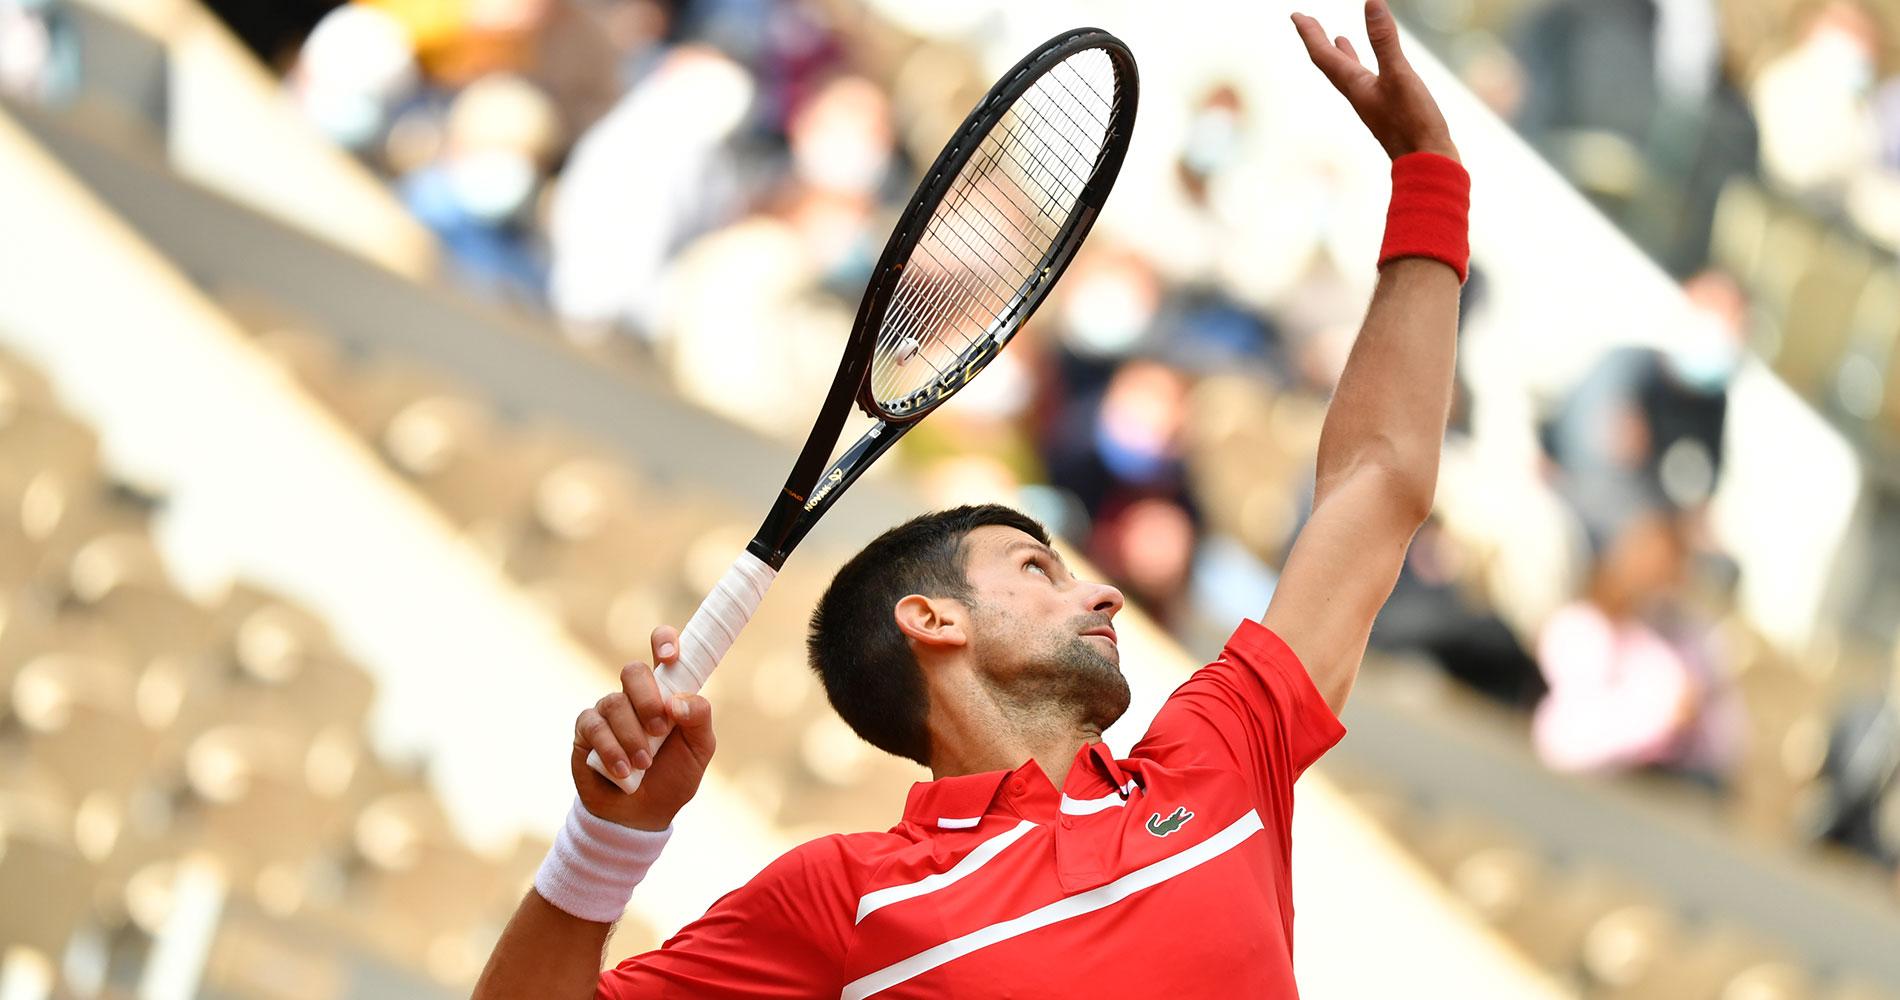 Novak Djokovic at Roland-Garros 2020 Round 2